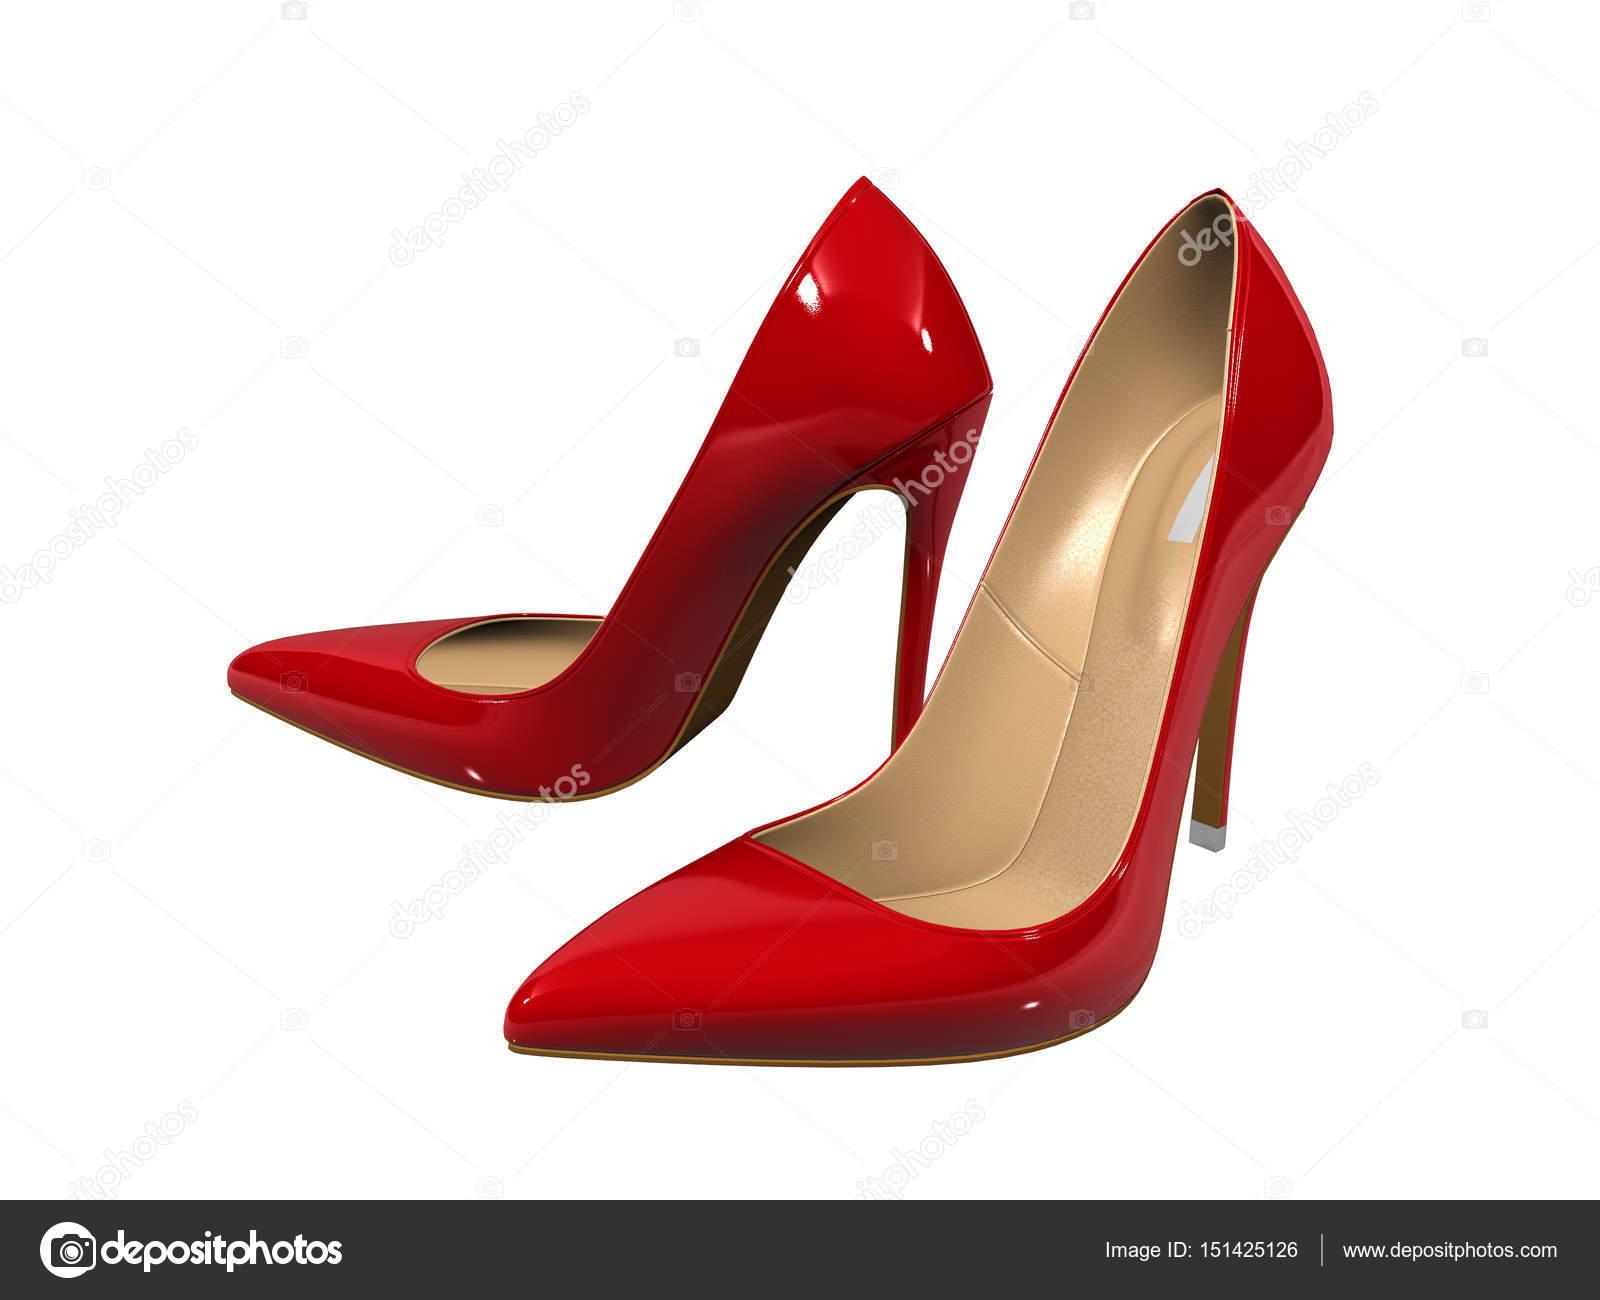 nuovi stili aad8c 38a36 Donne scarpe col tacco rosse sopra priorità bassa bianca ...